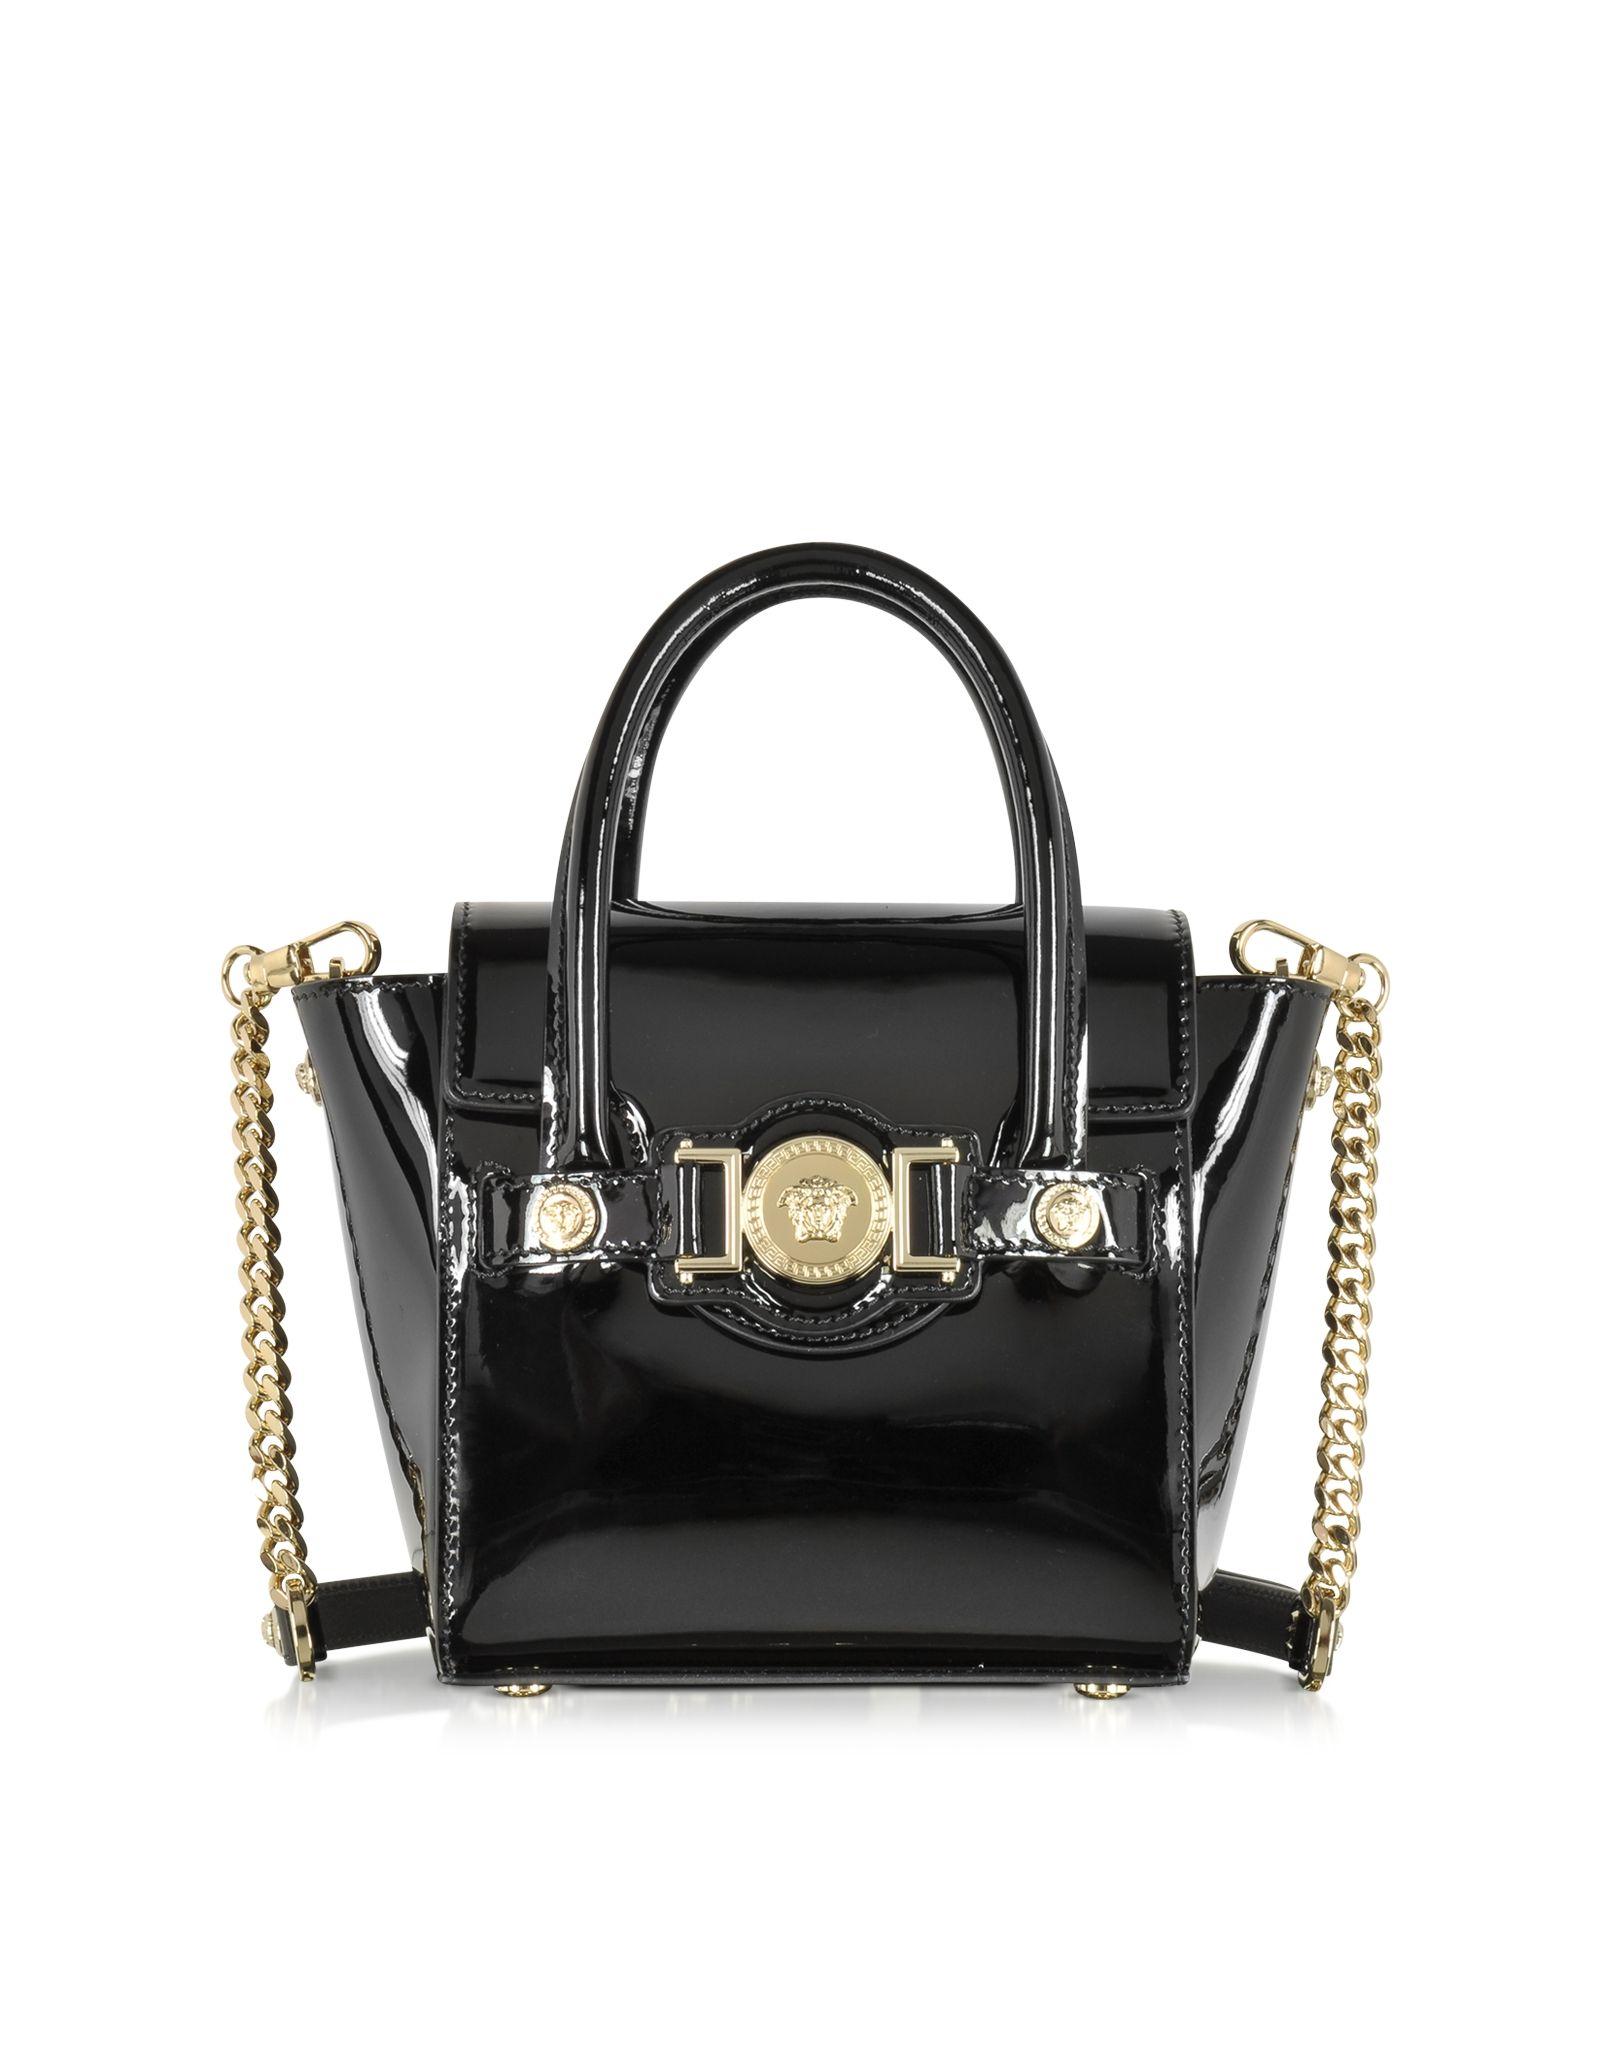 Versace Black Patent Leather Signature Mini Bag $1,625.00 Actual ...